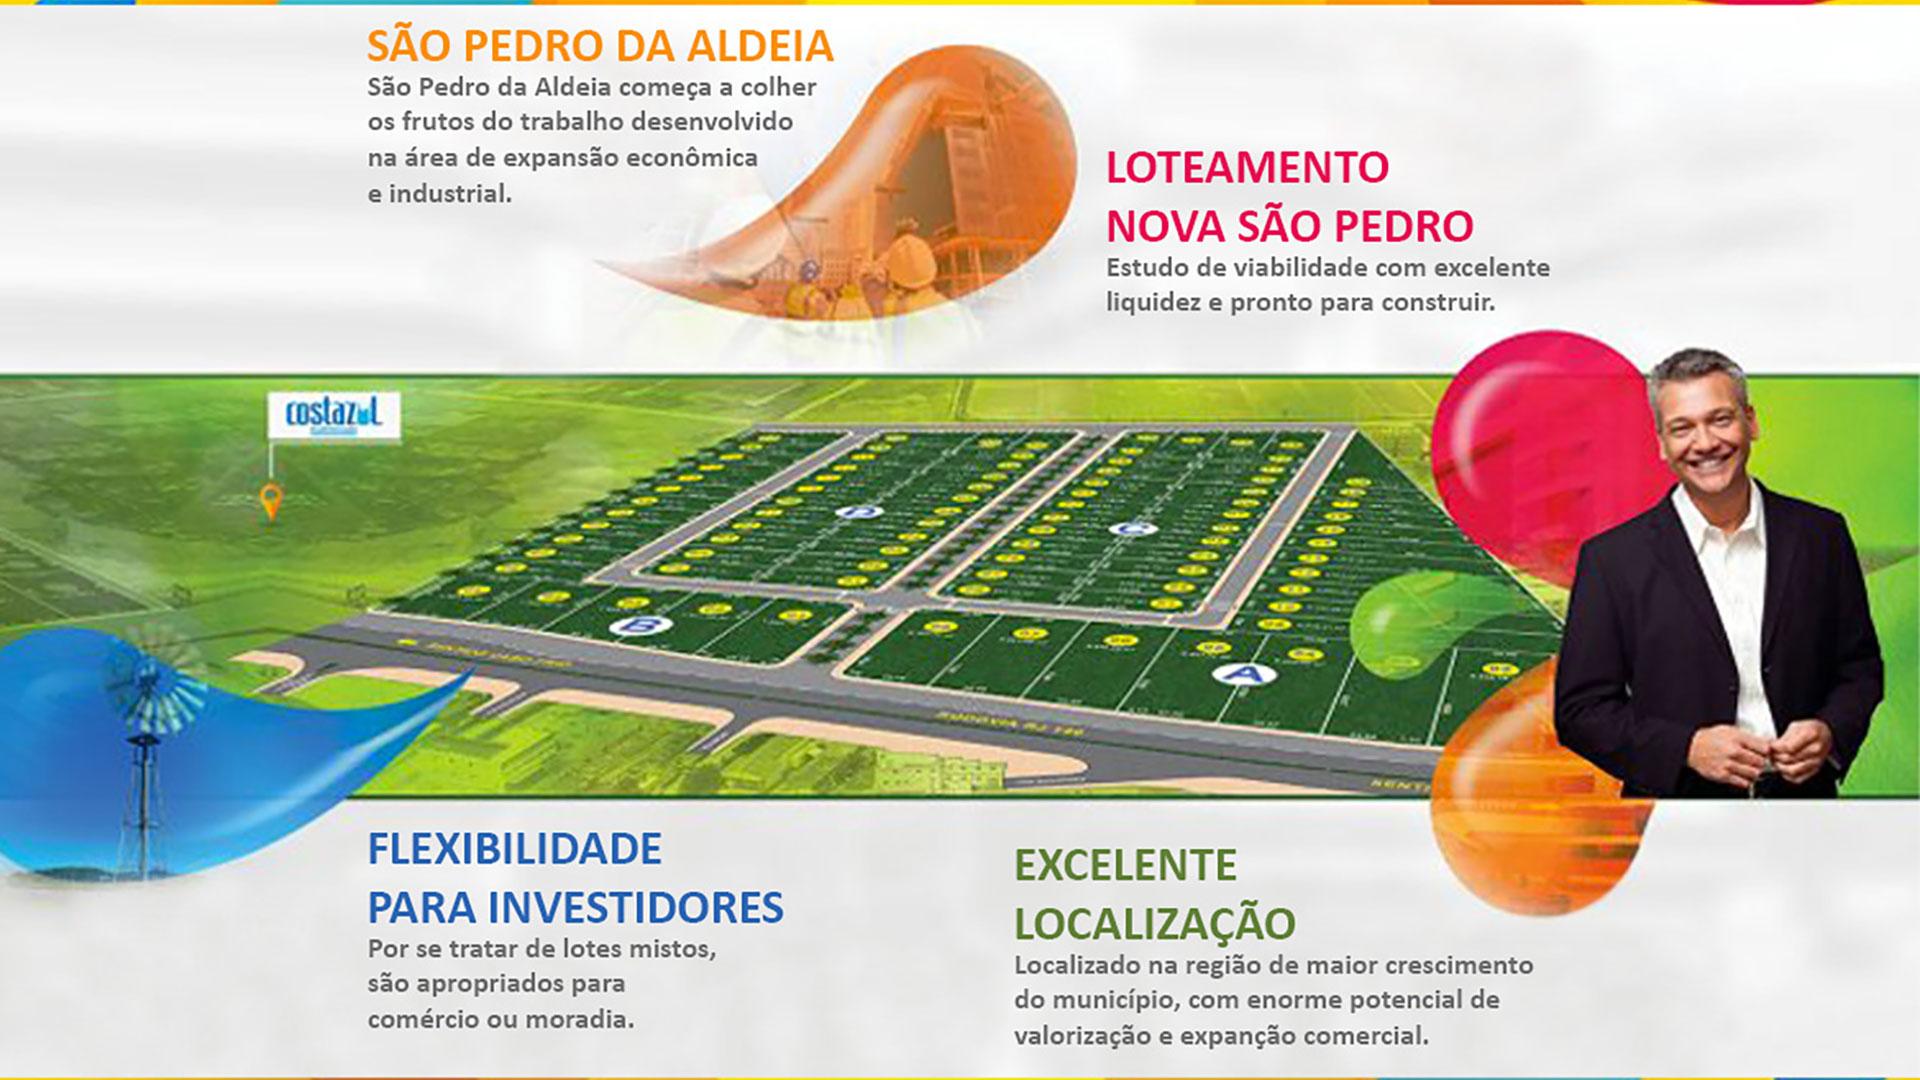 Loteamento Nova São Pedro